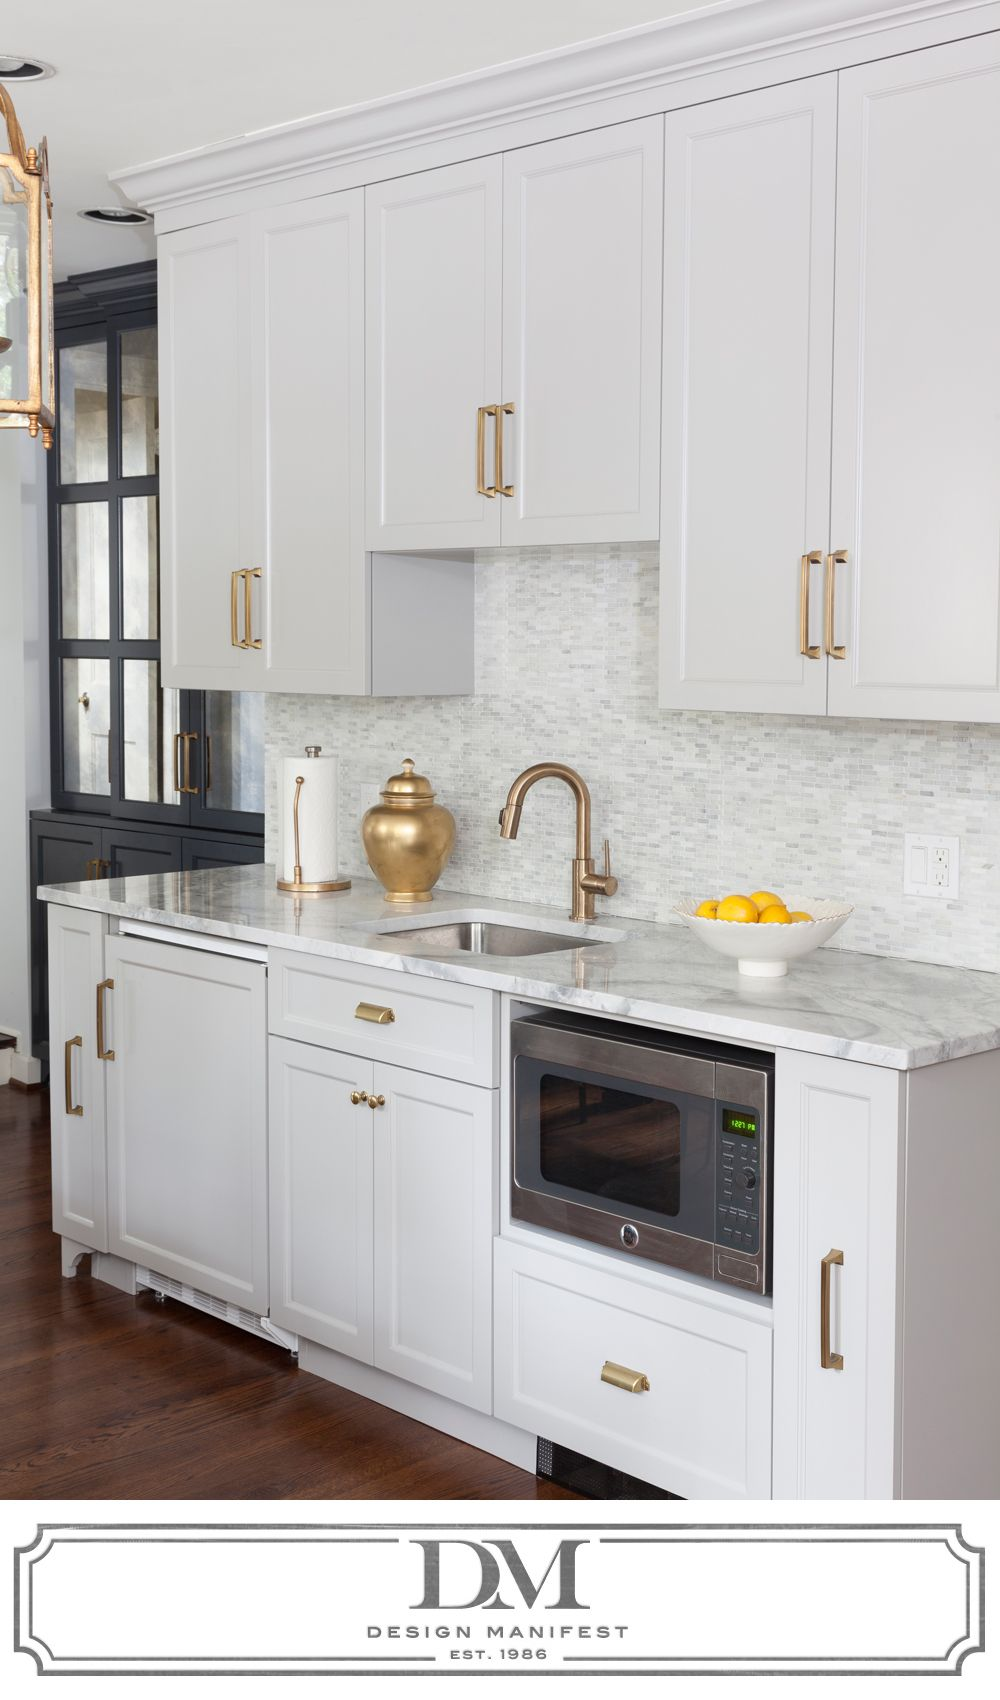 Kitchen Appliance Shop Snack Zone In Kitchen With 2nd Sink Beverage Refrigerator And